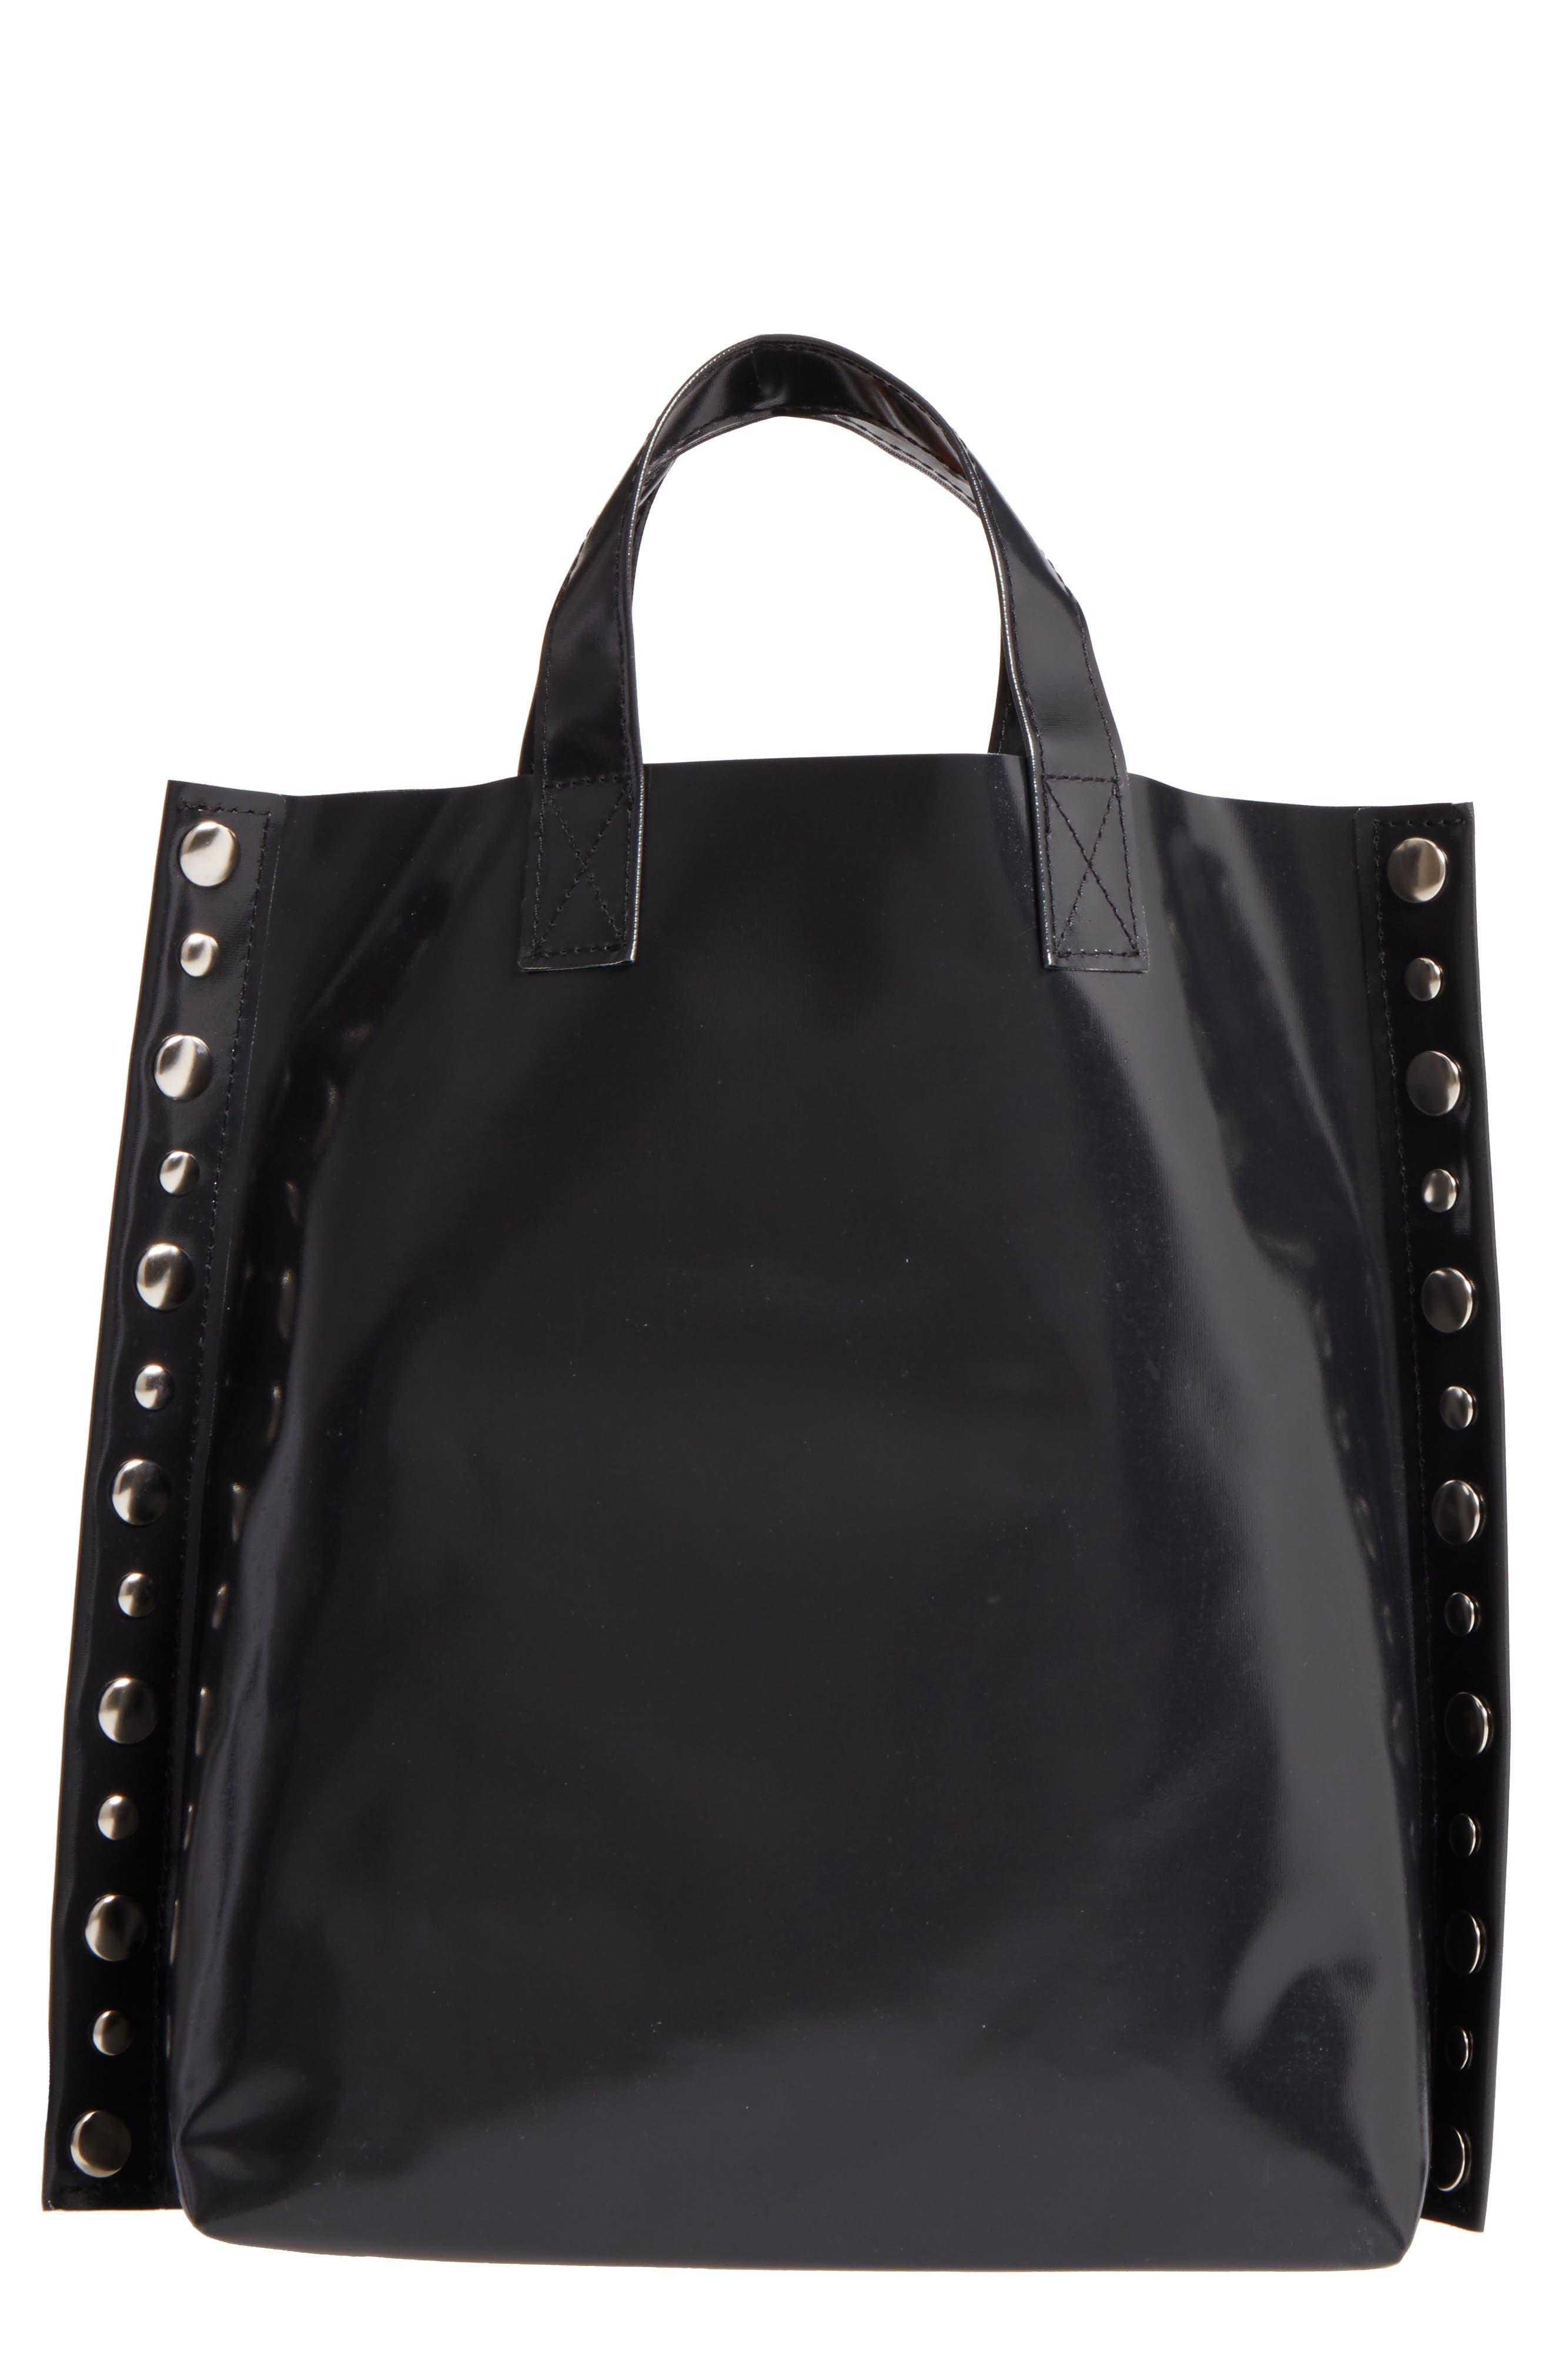 Main Image - Tricot Comme des Garçons Studded Faux Leather Tote